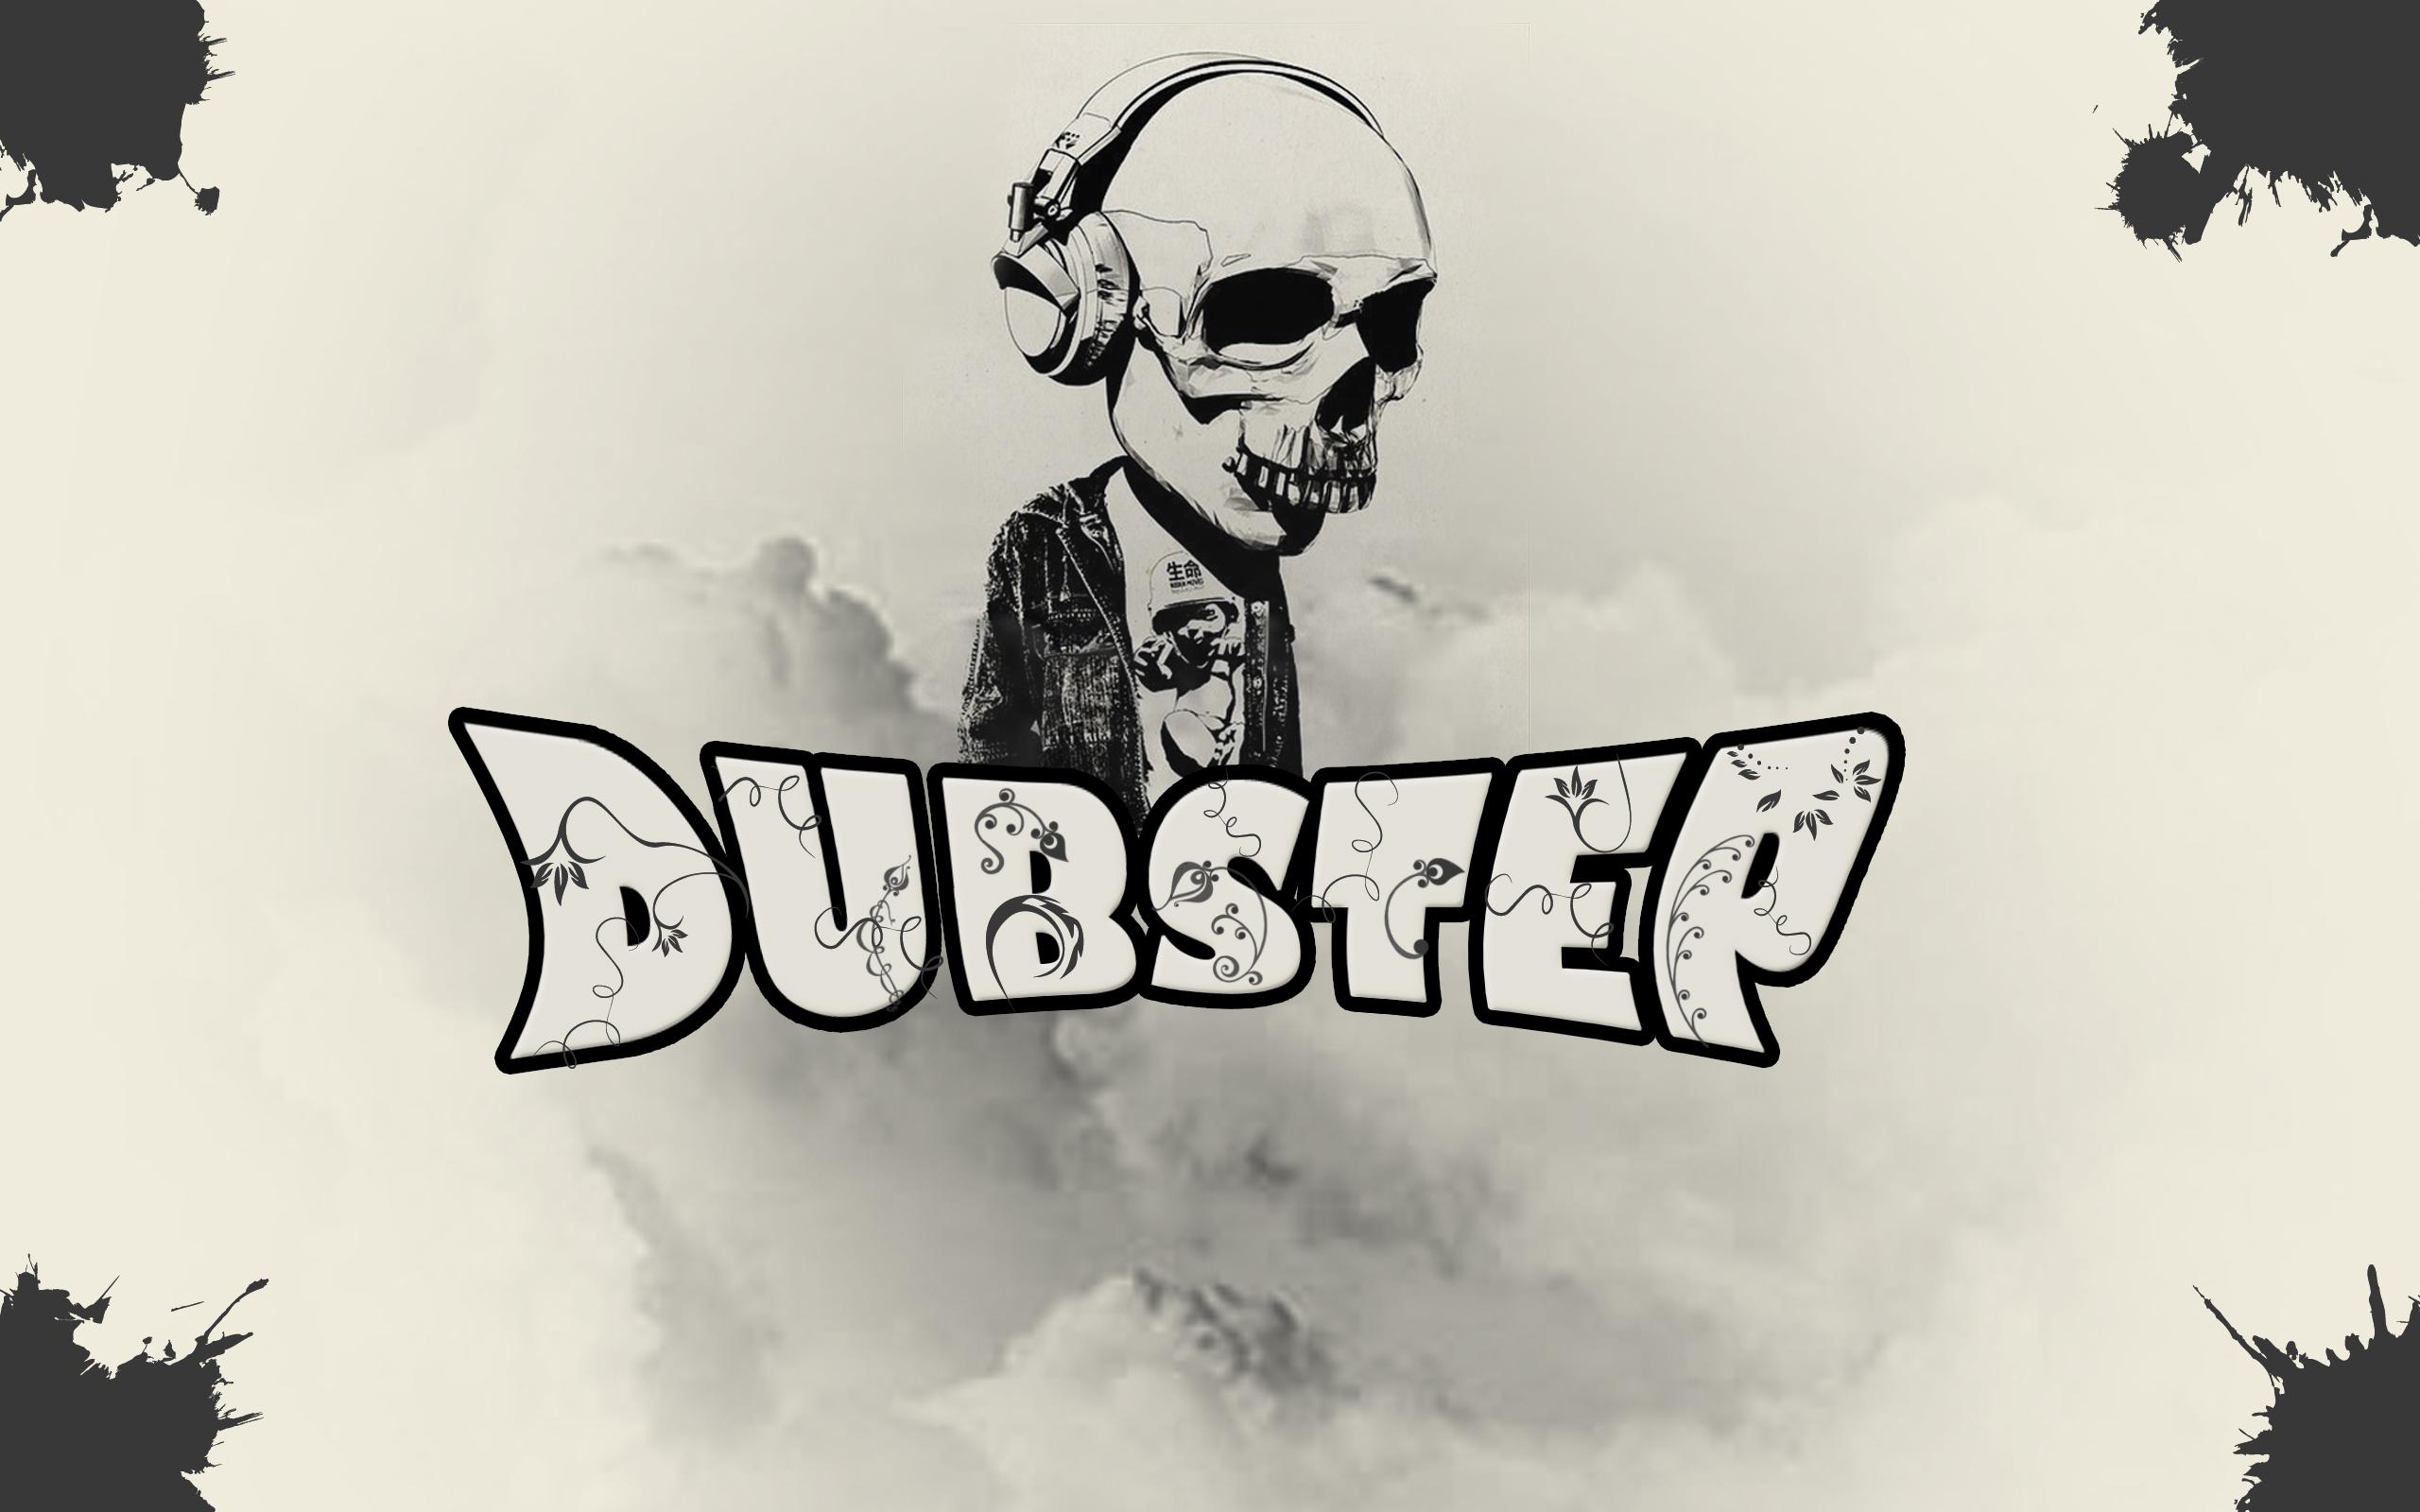 Скачать va melodic dubstep [by dubstep music] vol. 4 (2016) mp3.